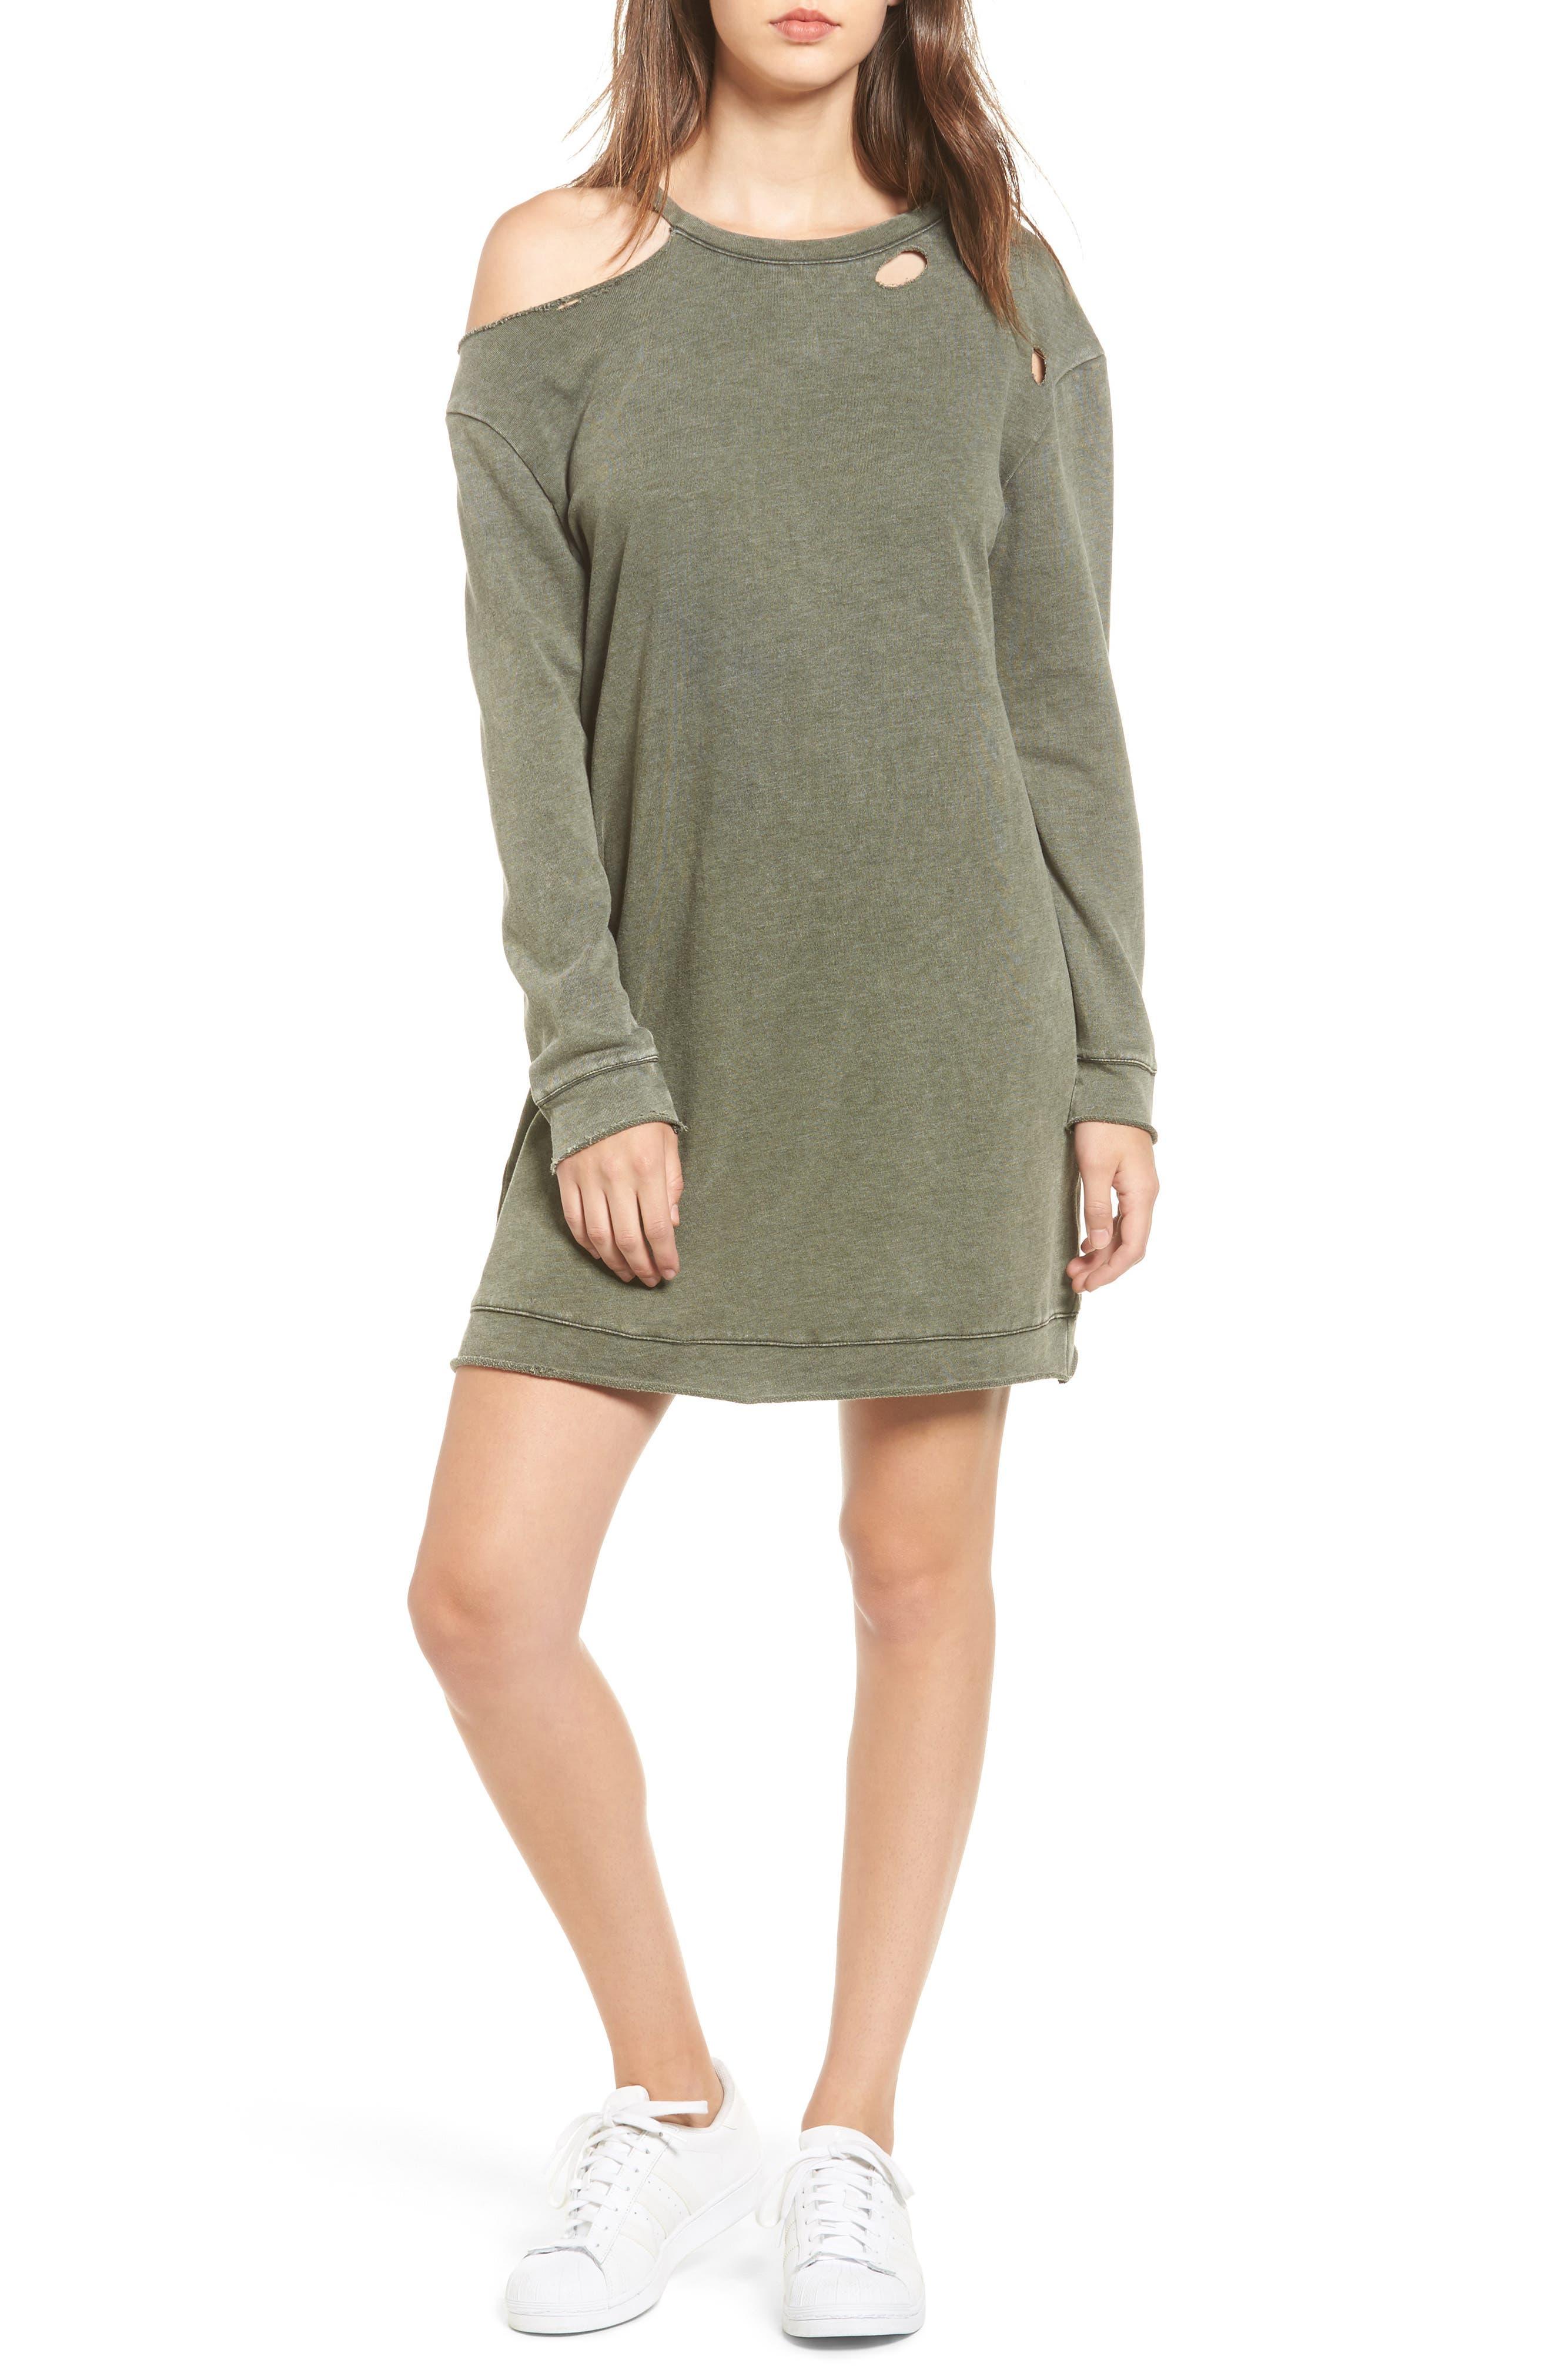 Ripped Sweatshirt Dress,                             Main thumbnail 1, color,                             Olive Dark